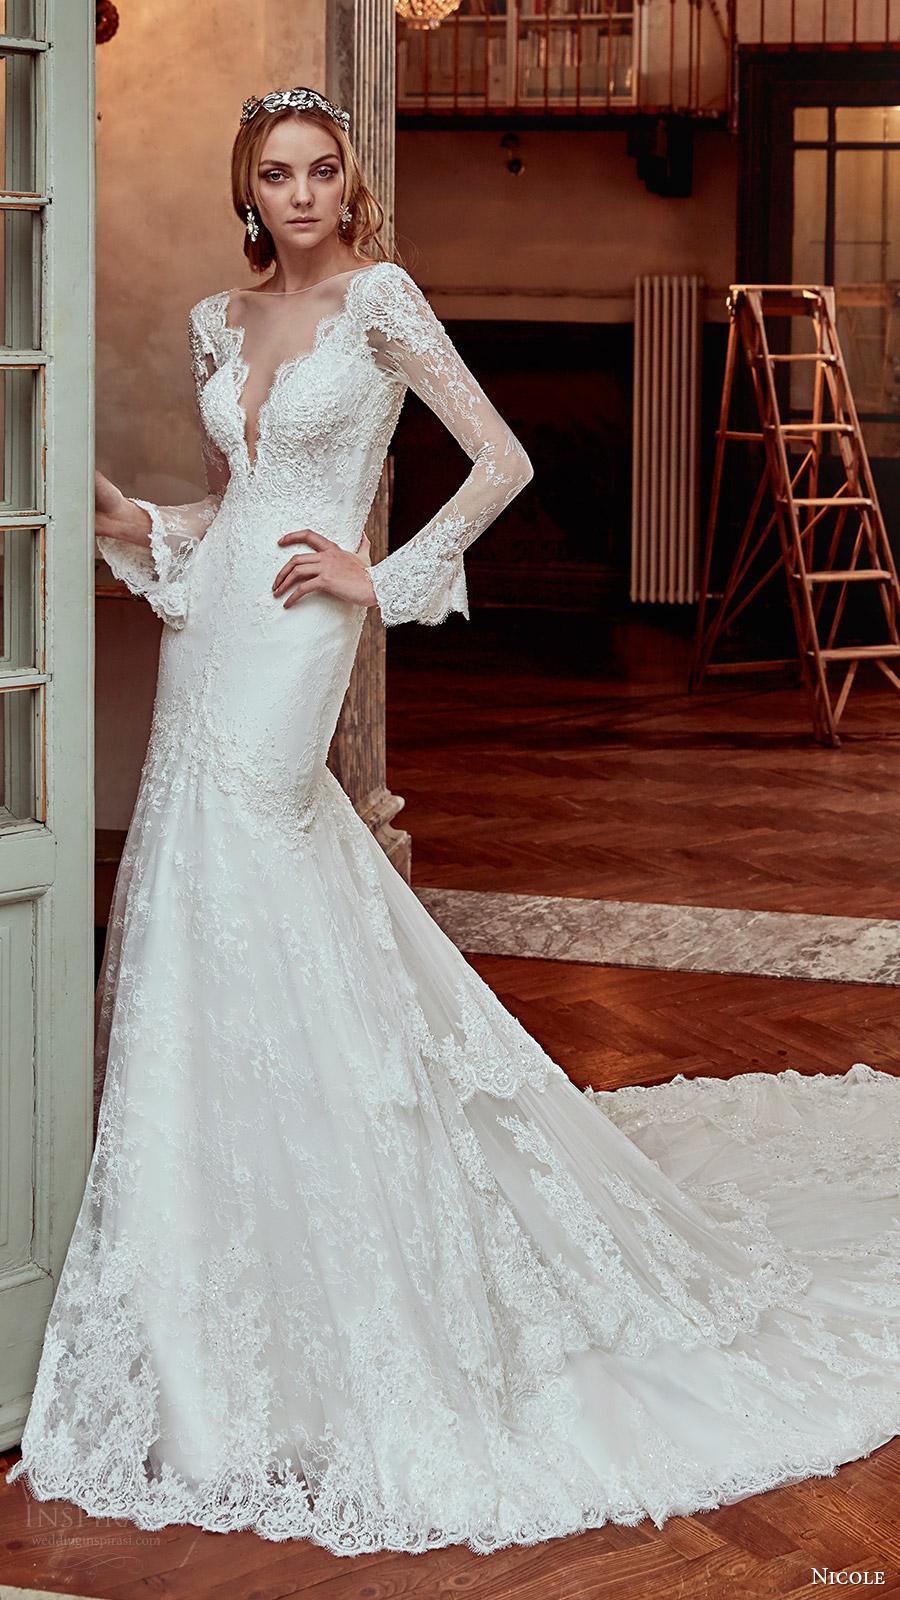 Nicole 2017 wedding dresses wedding inspirasi for Long sleeve mermaid wedding dresses 2017